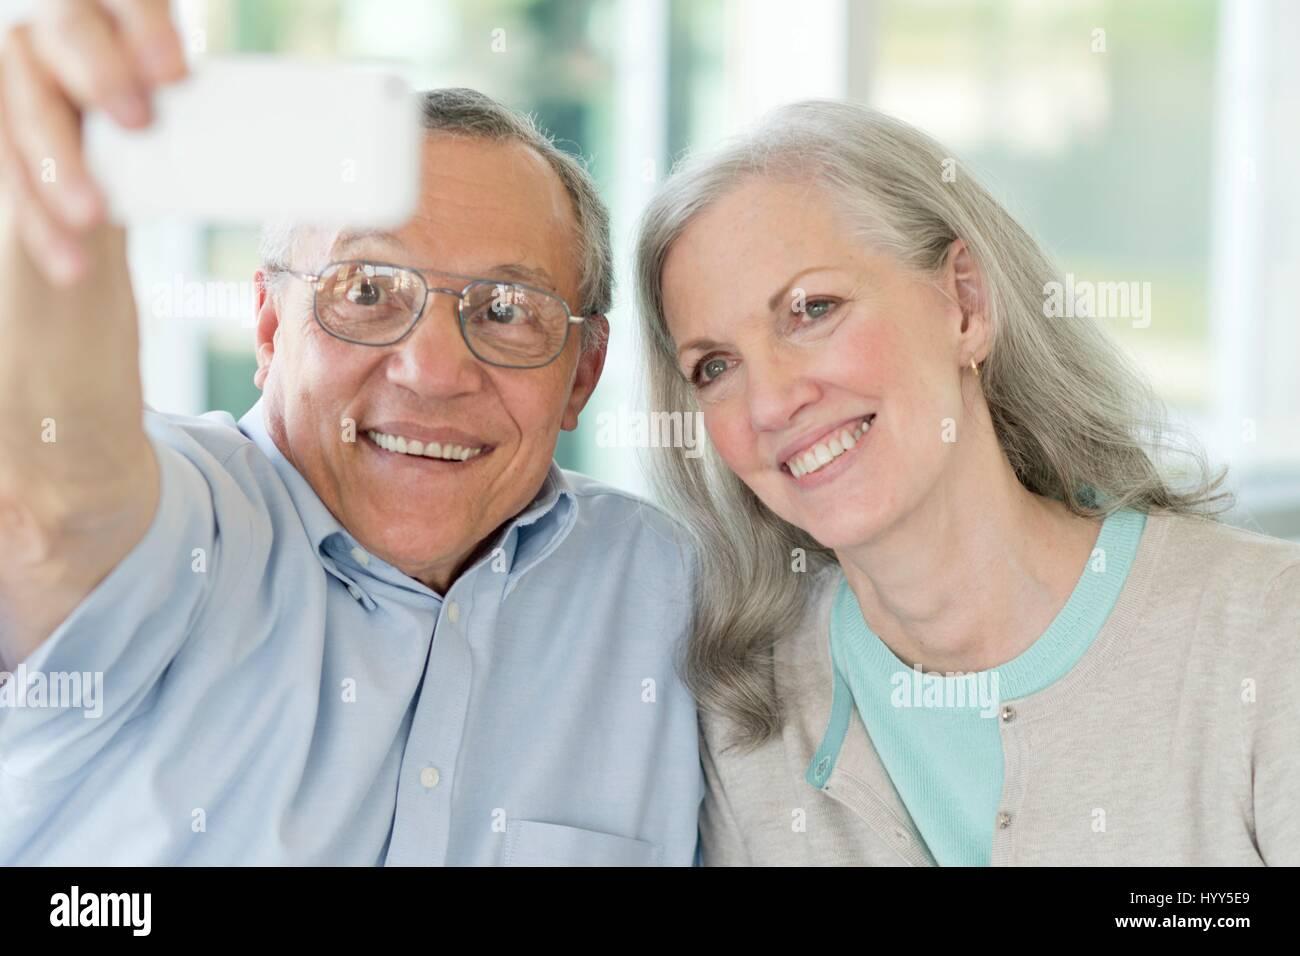 Portrait of senior couple taking selfie on phone. - Stock Image